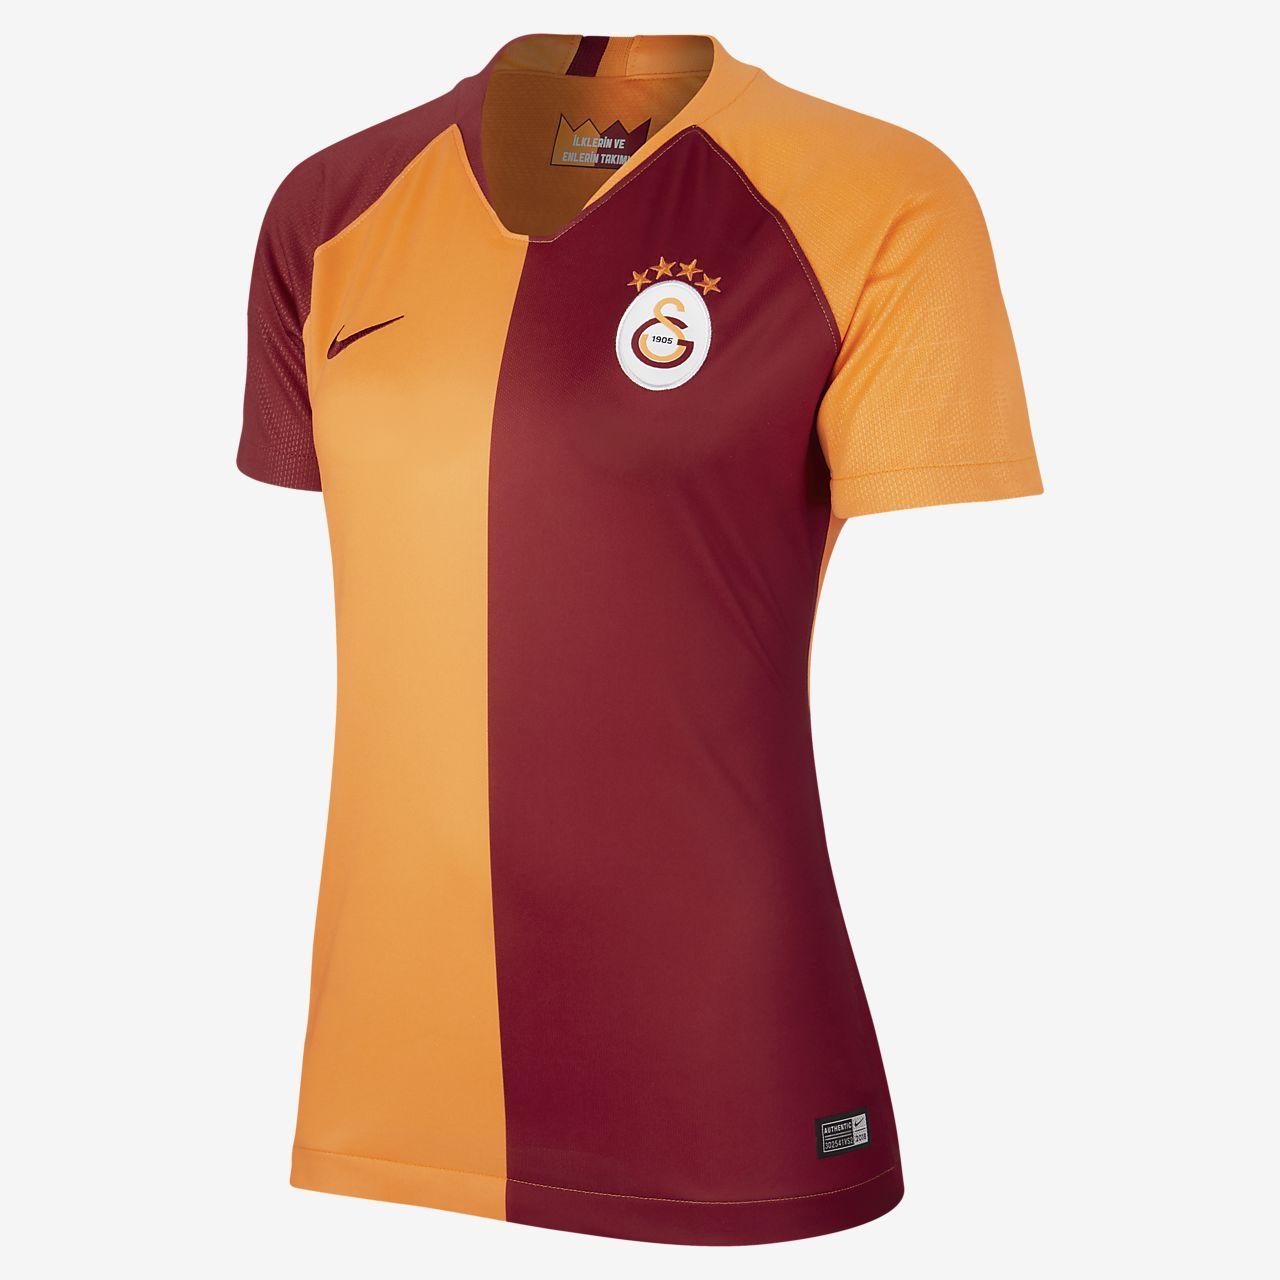 Calcio Nike Stadium Home k Da 201819 S Maglia Galatasaray Donna 1Ofw5fq